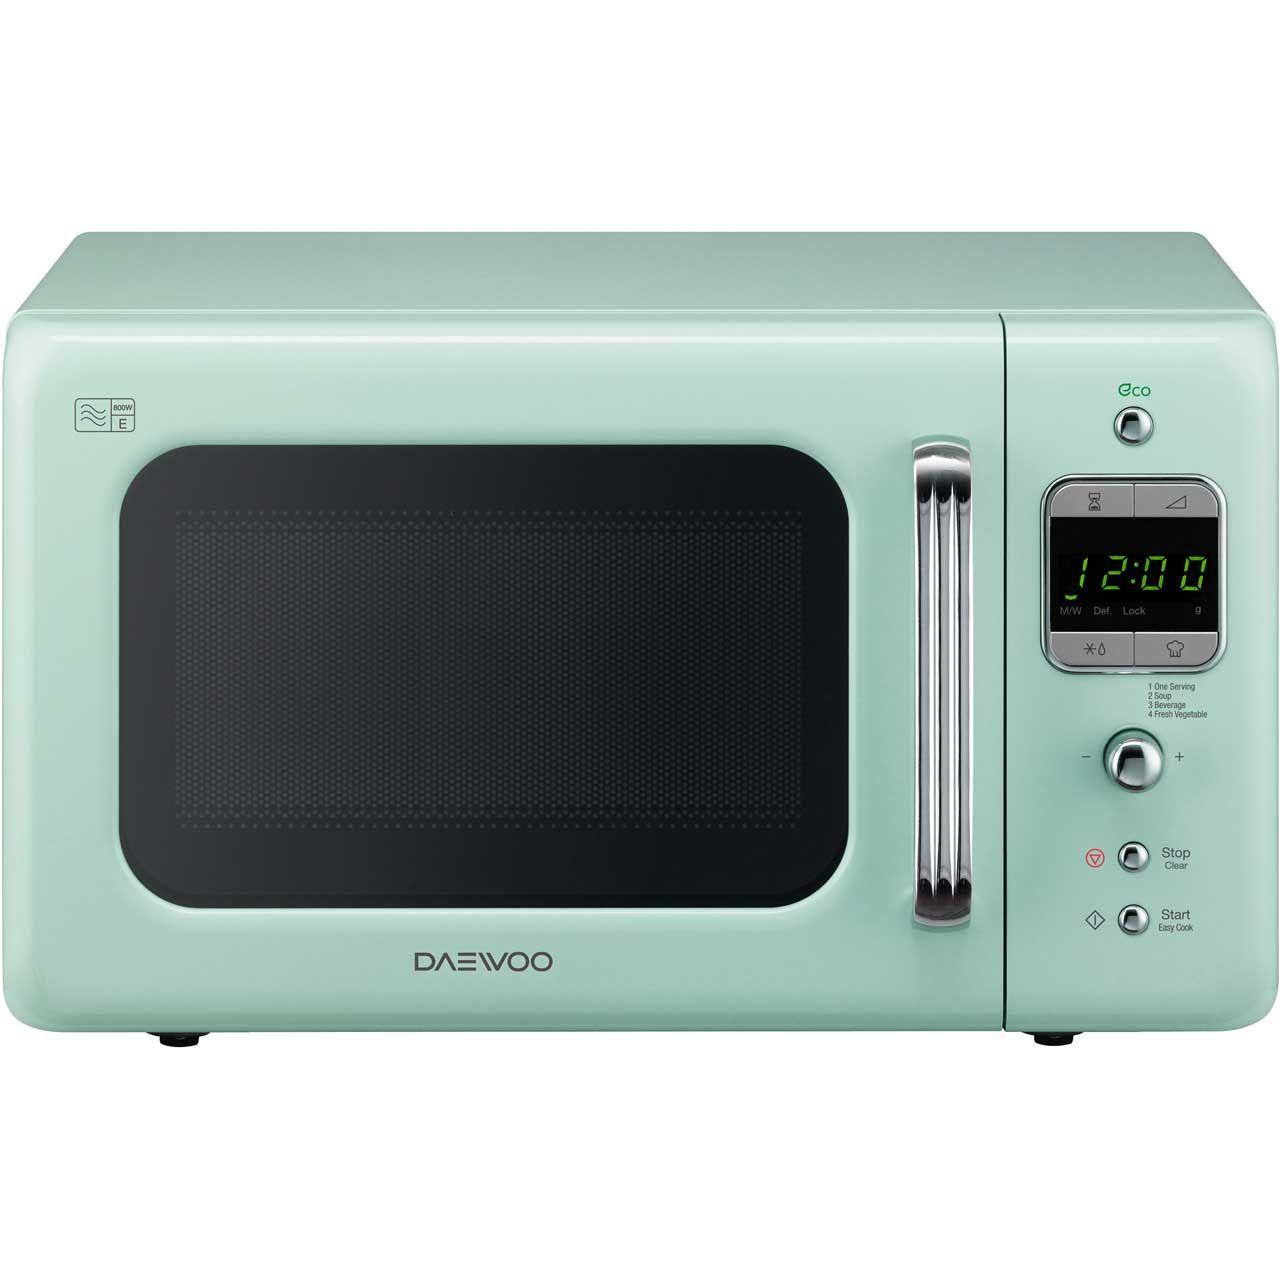 Daewoo Retro Style KOR7LBKM Standard Microwave Oven - Mint | Robot ...